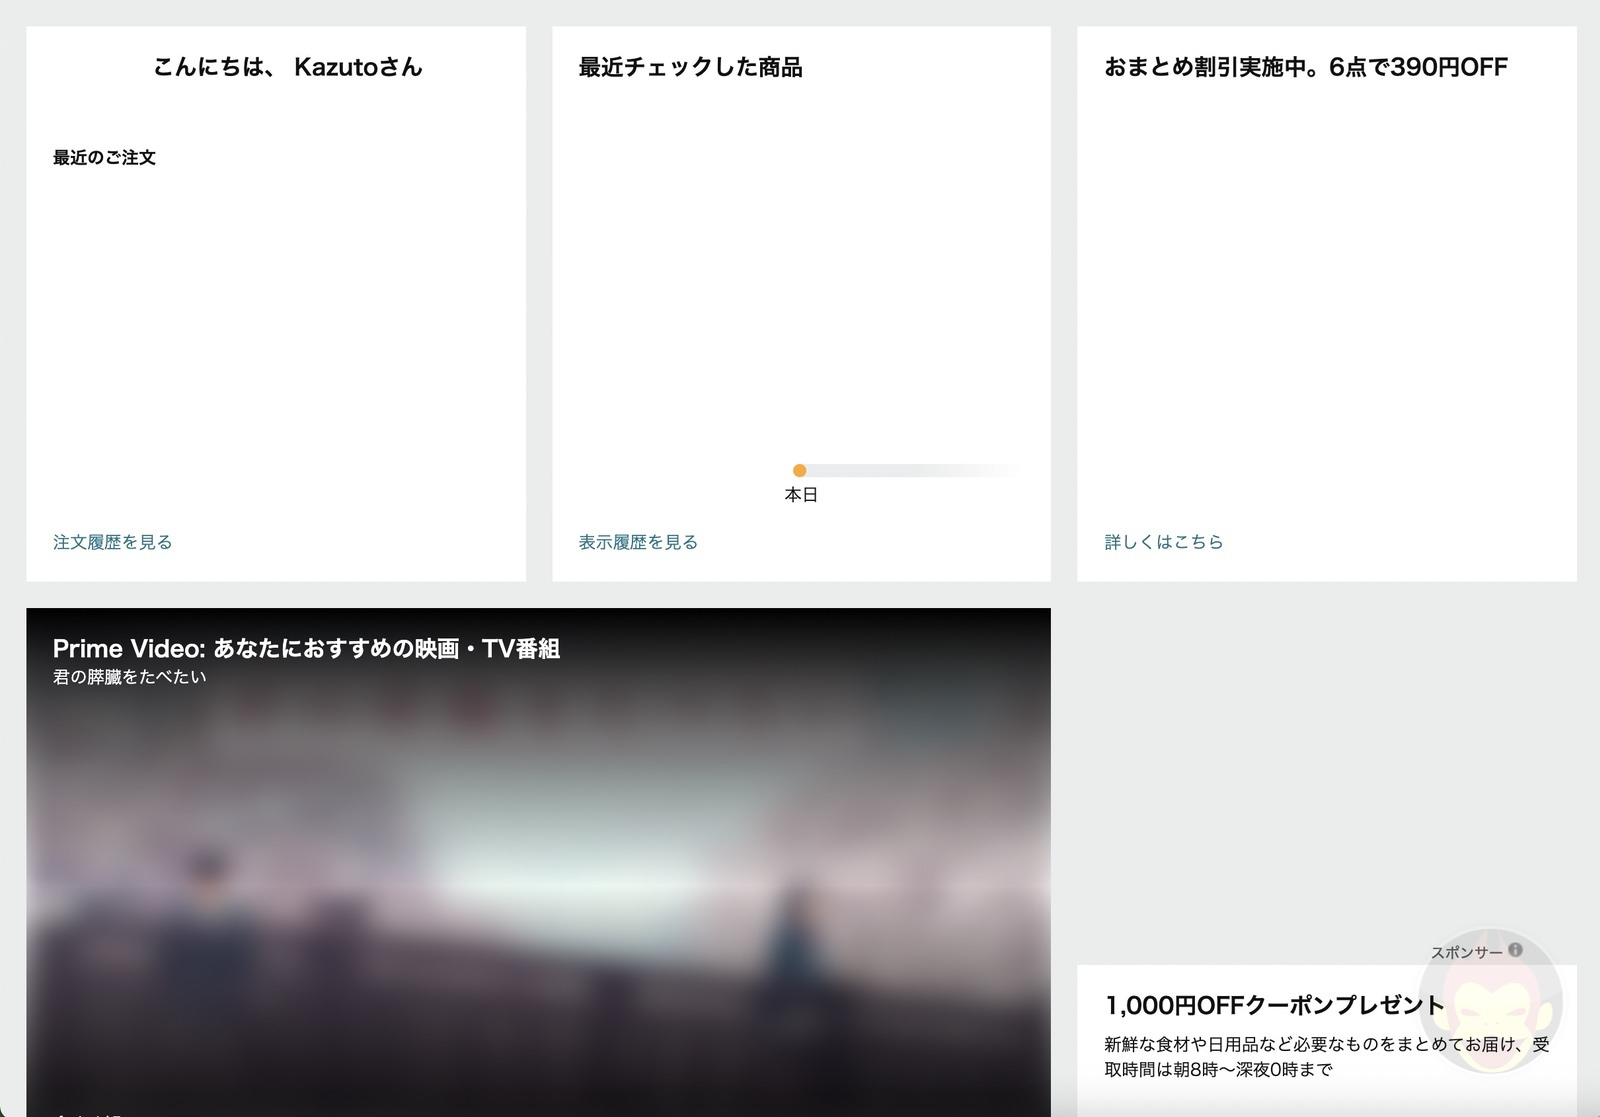 Chrome-Error-showing-images-02.jpg